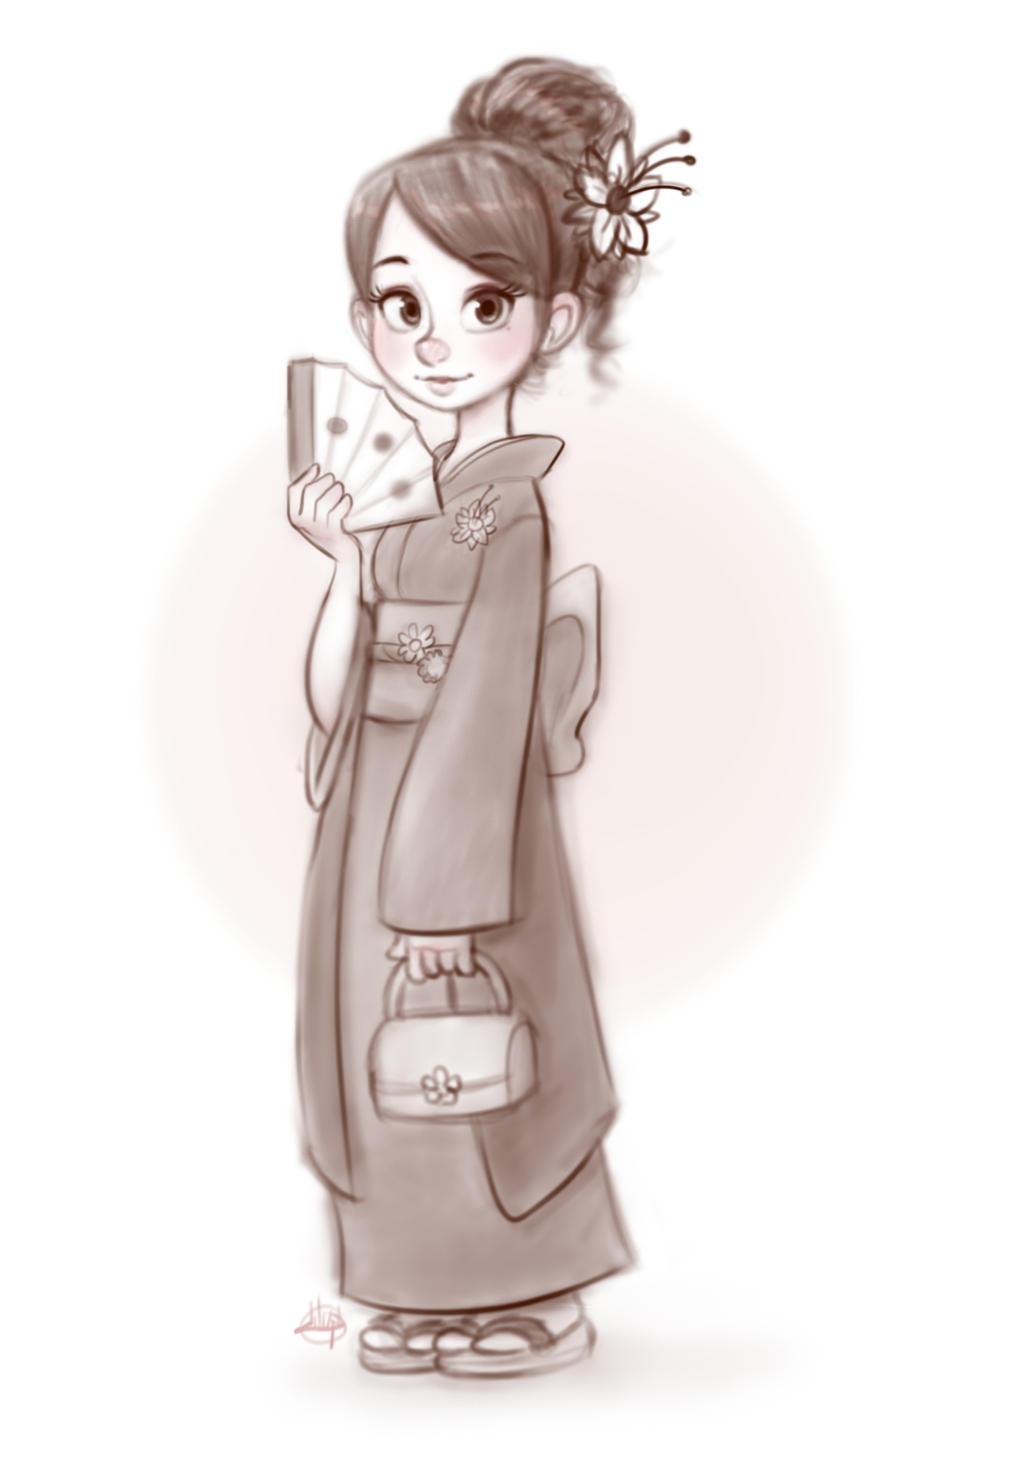 Character Design School Japan : Kimono girl by luigil on deviantart